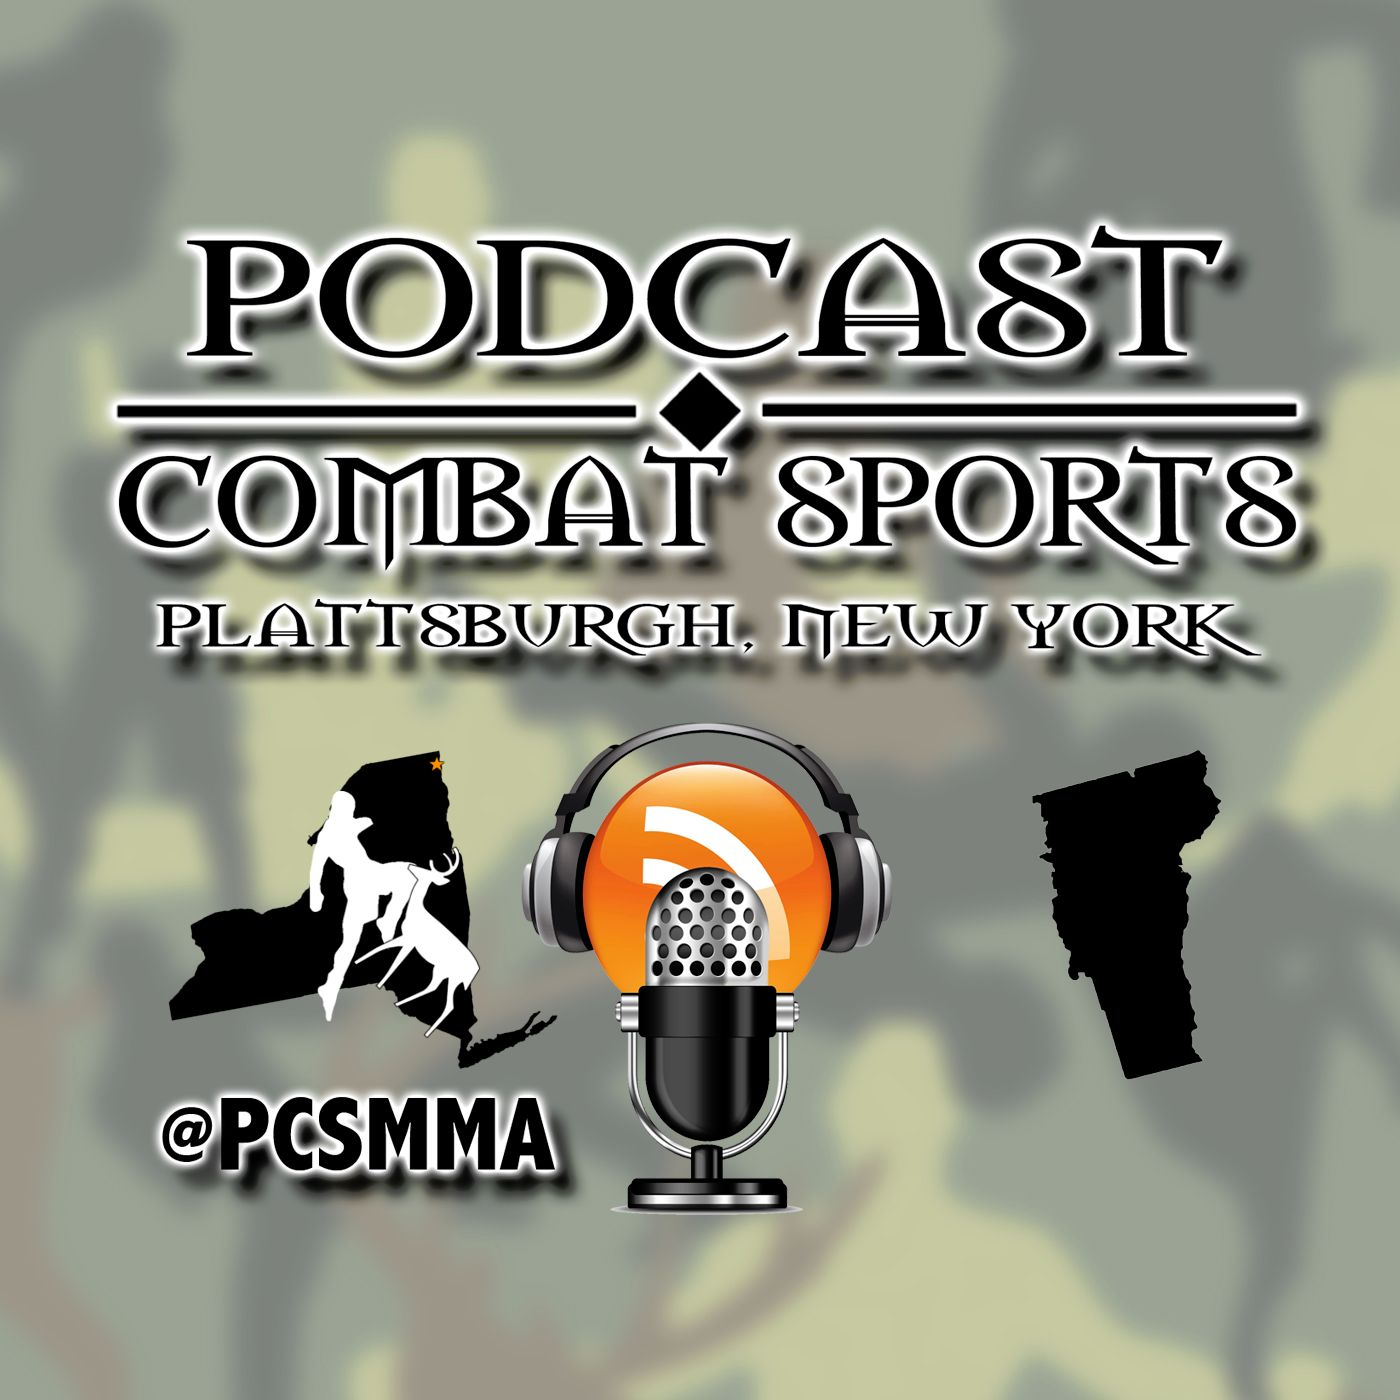 Podcast Combat Sports